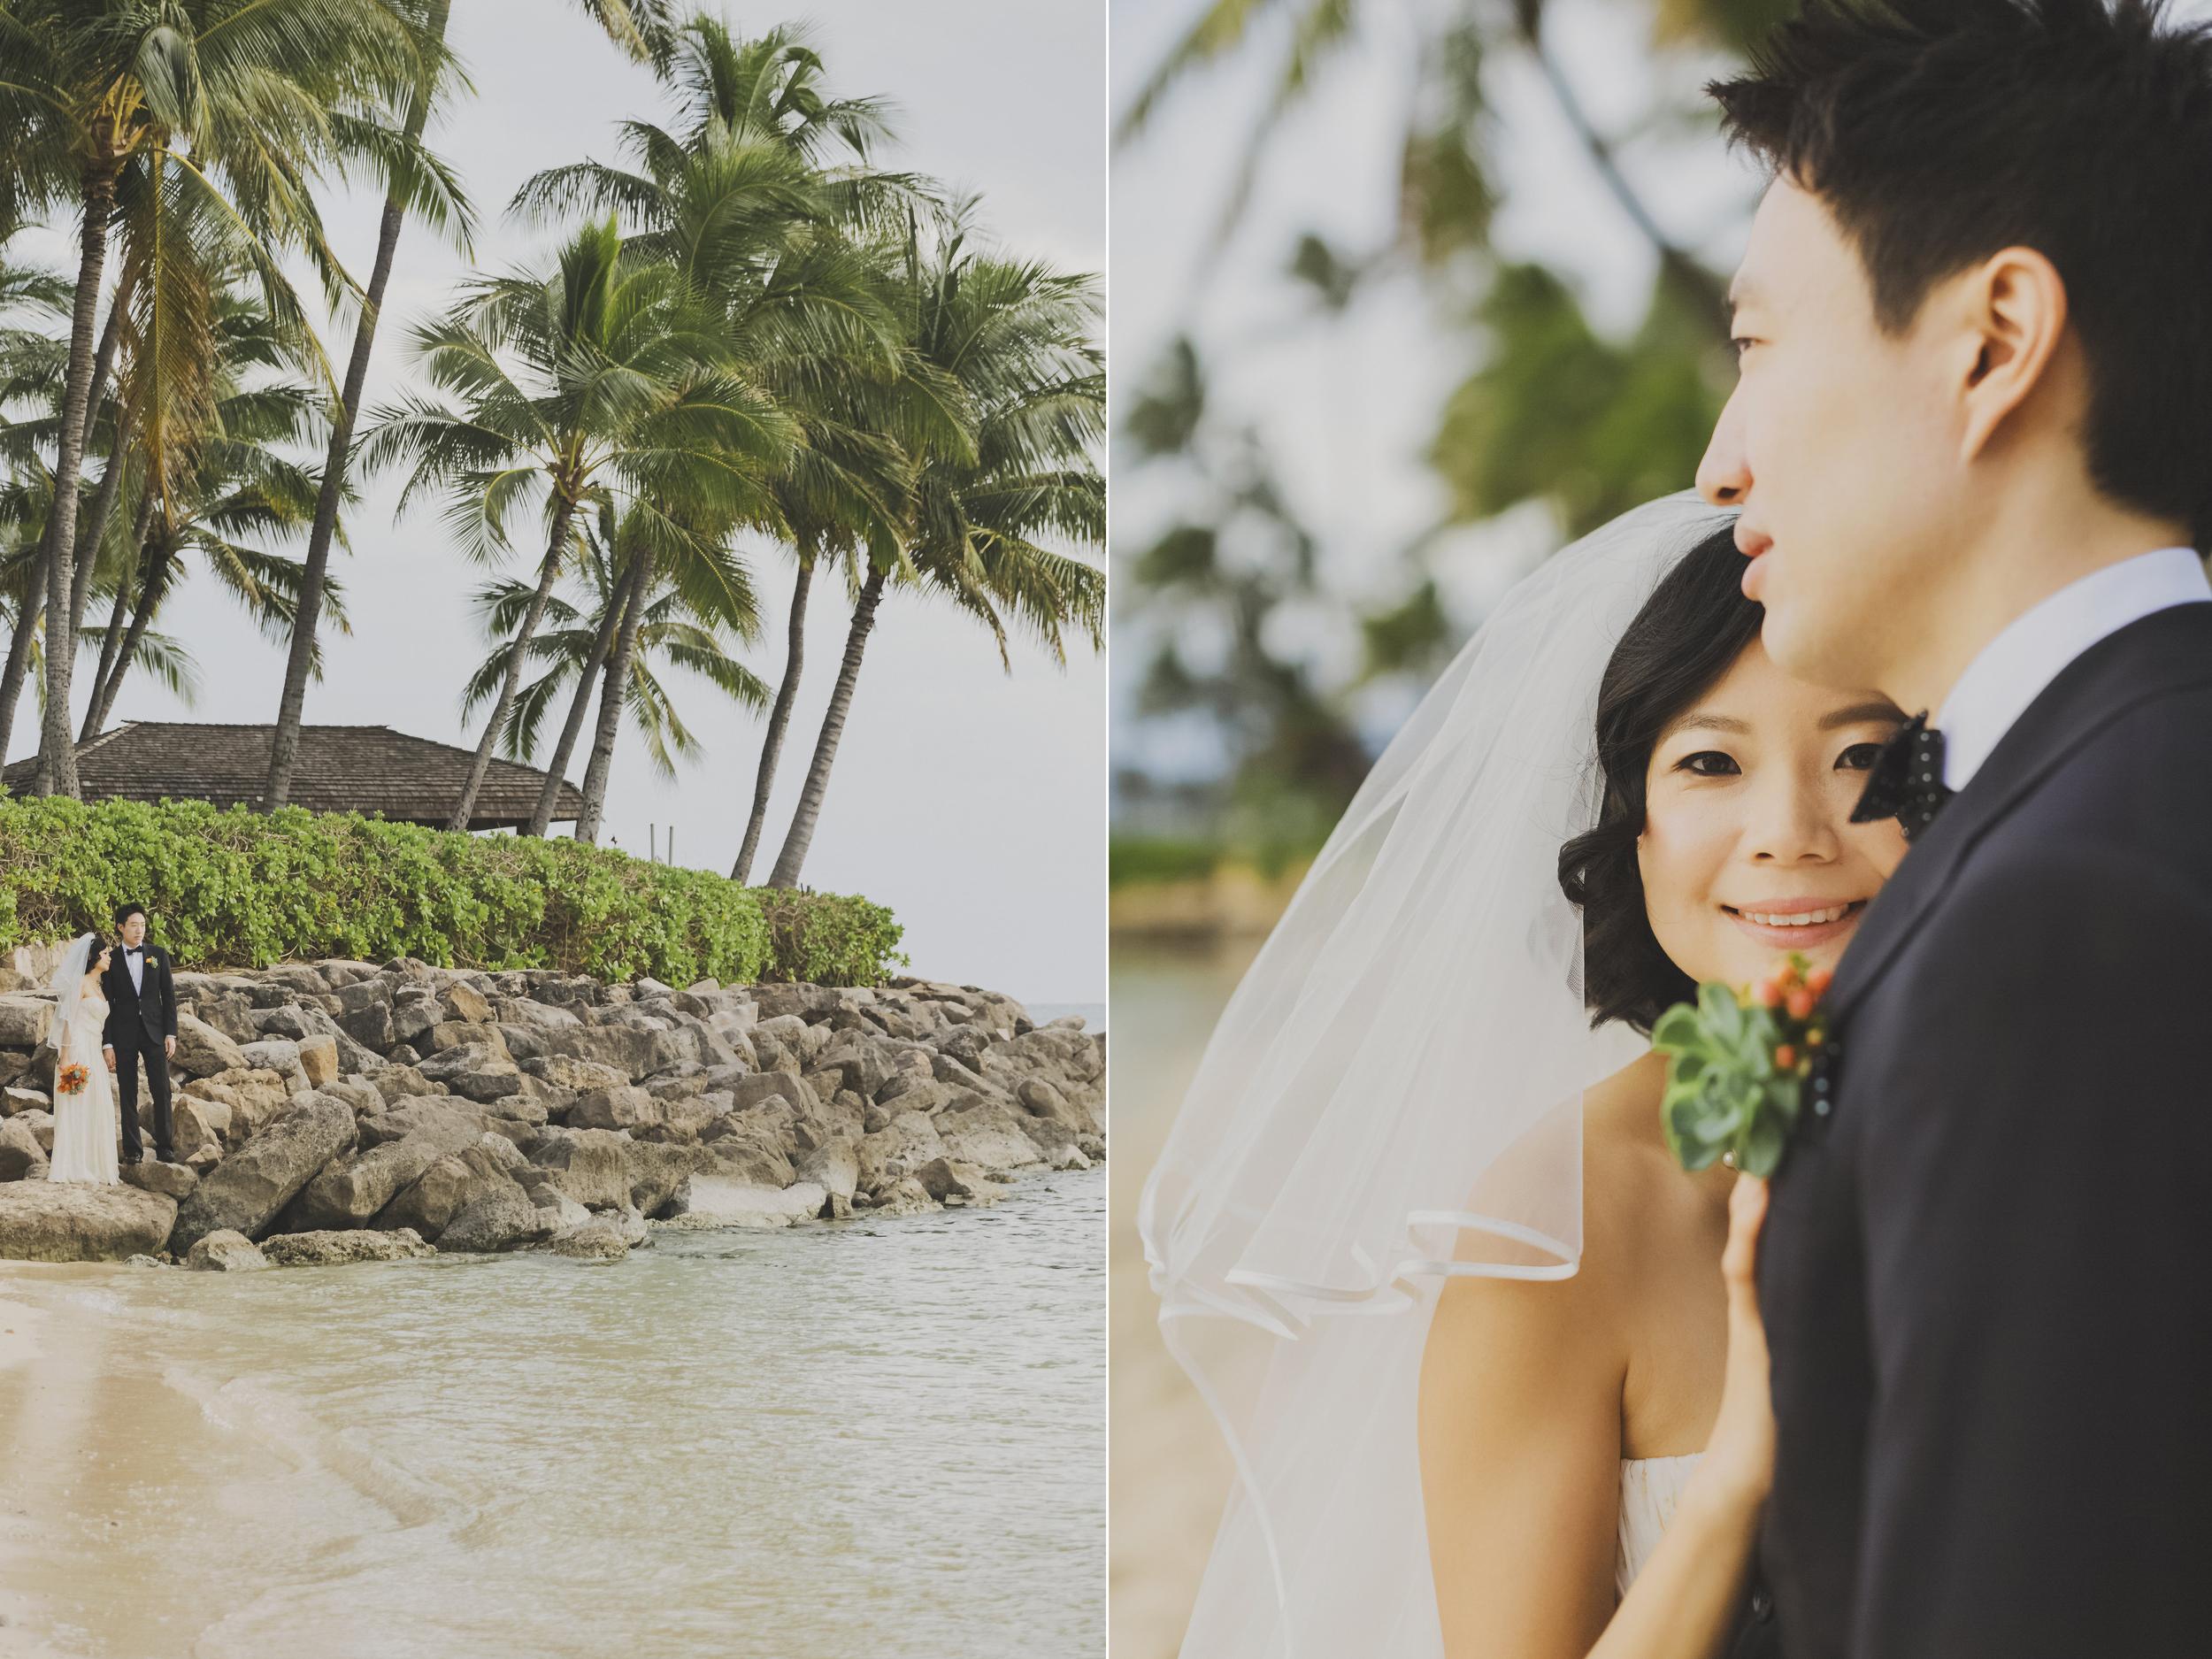 angie-diaz-photography-oahu-wedding-lanikuhonoa-shenshen-marshall-43.jpg